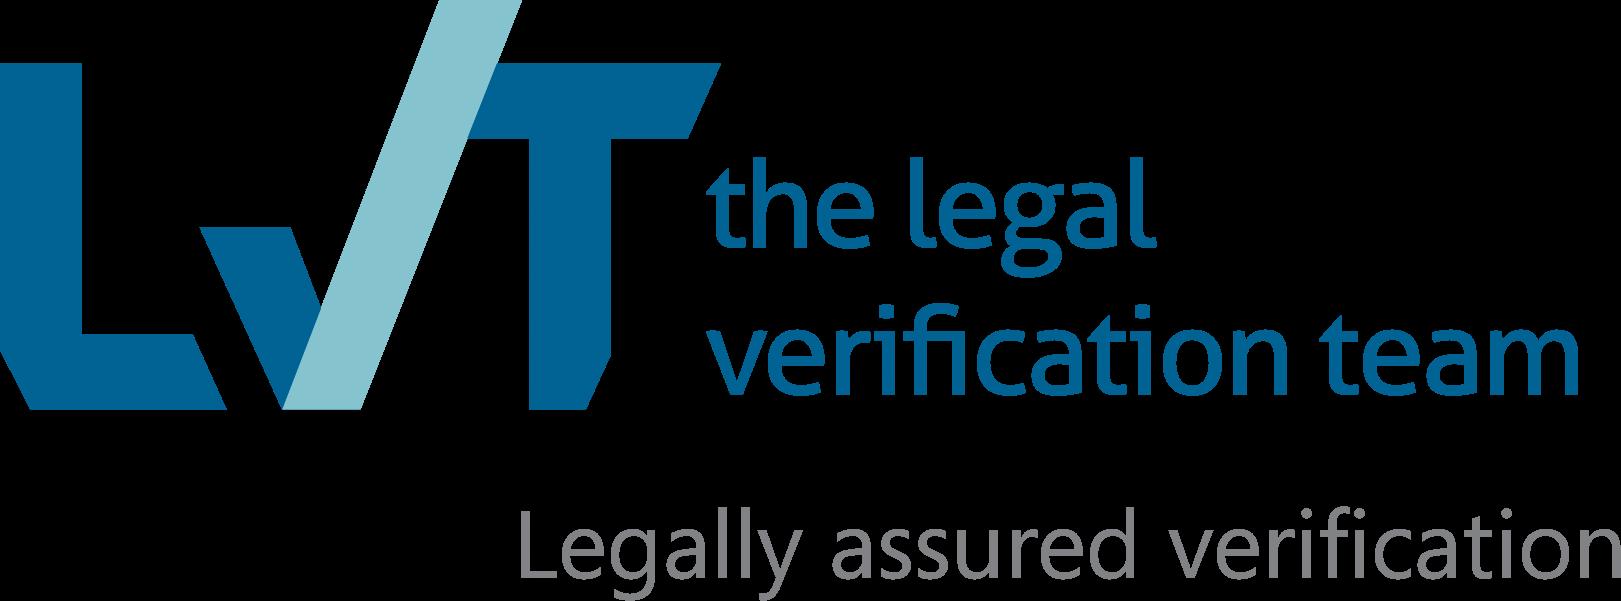 the legal verification team